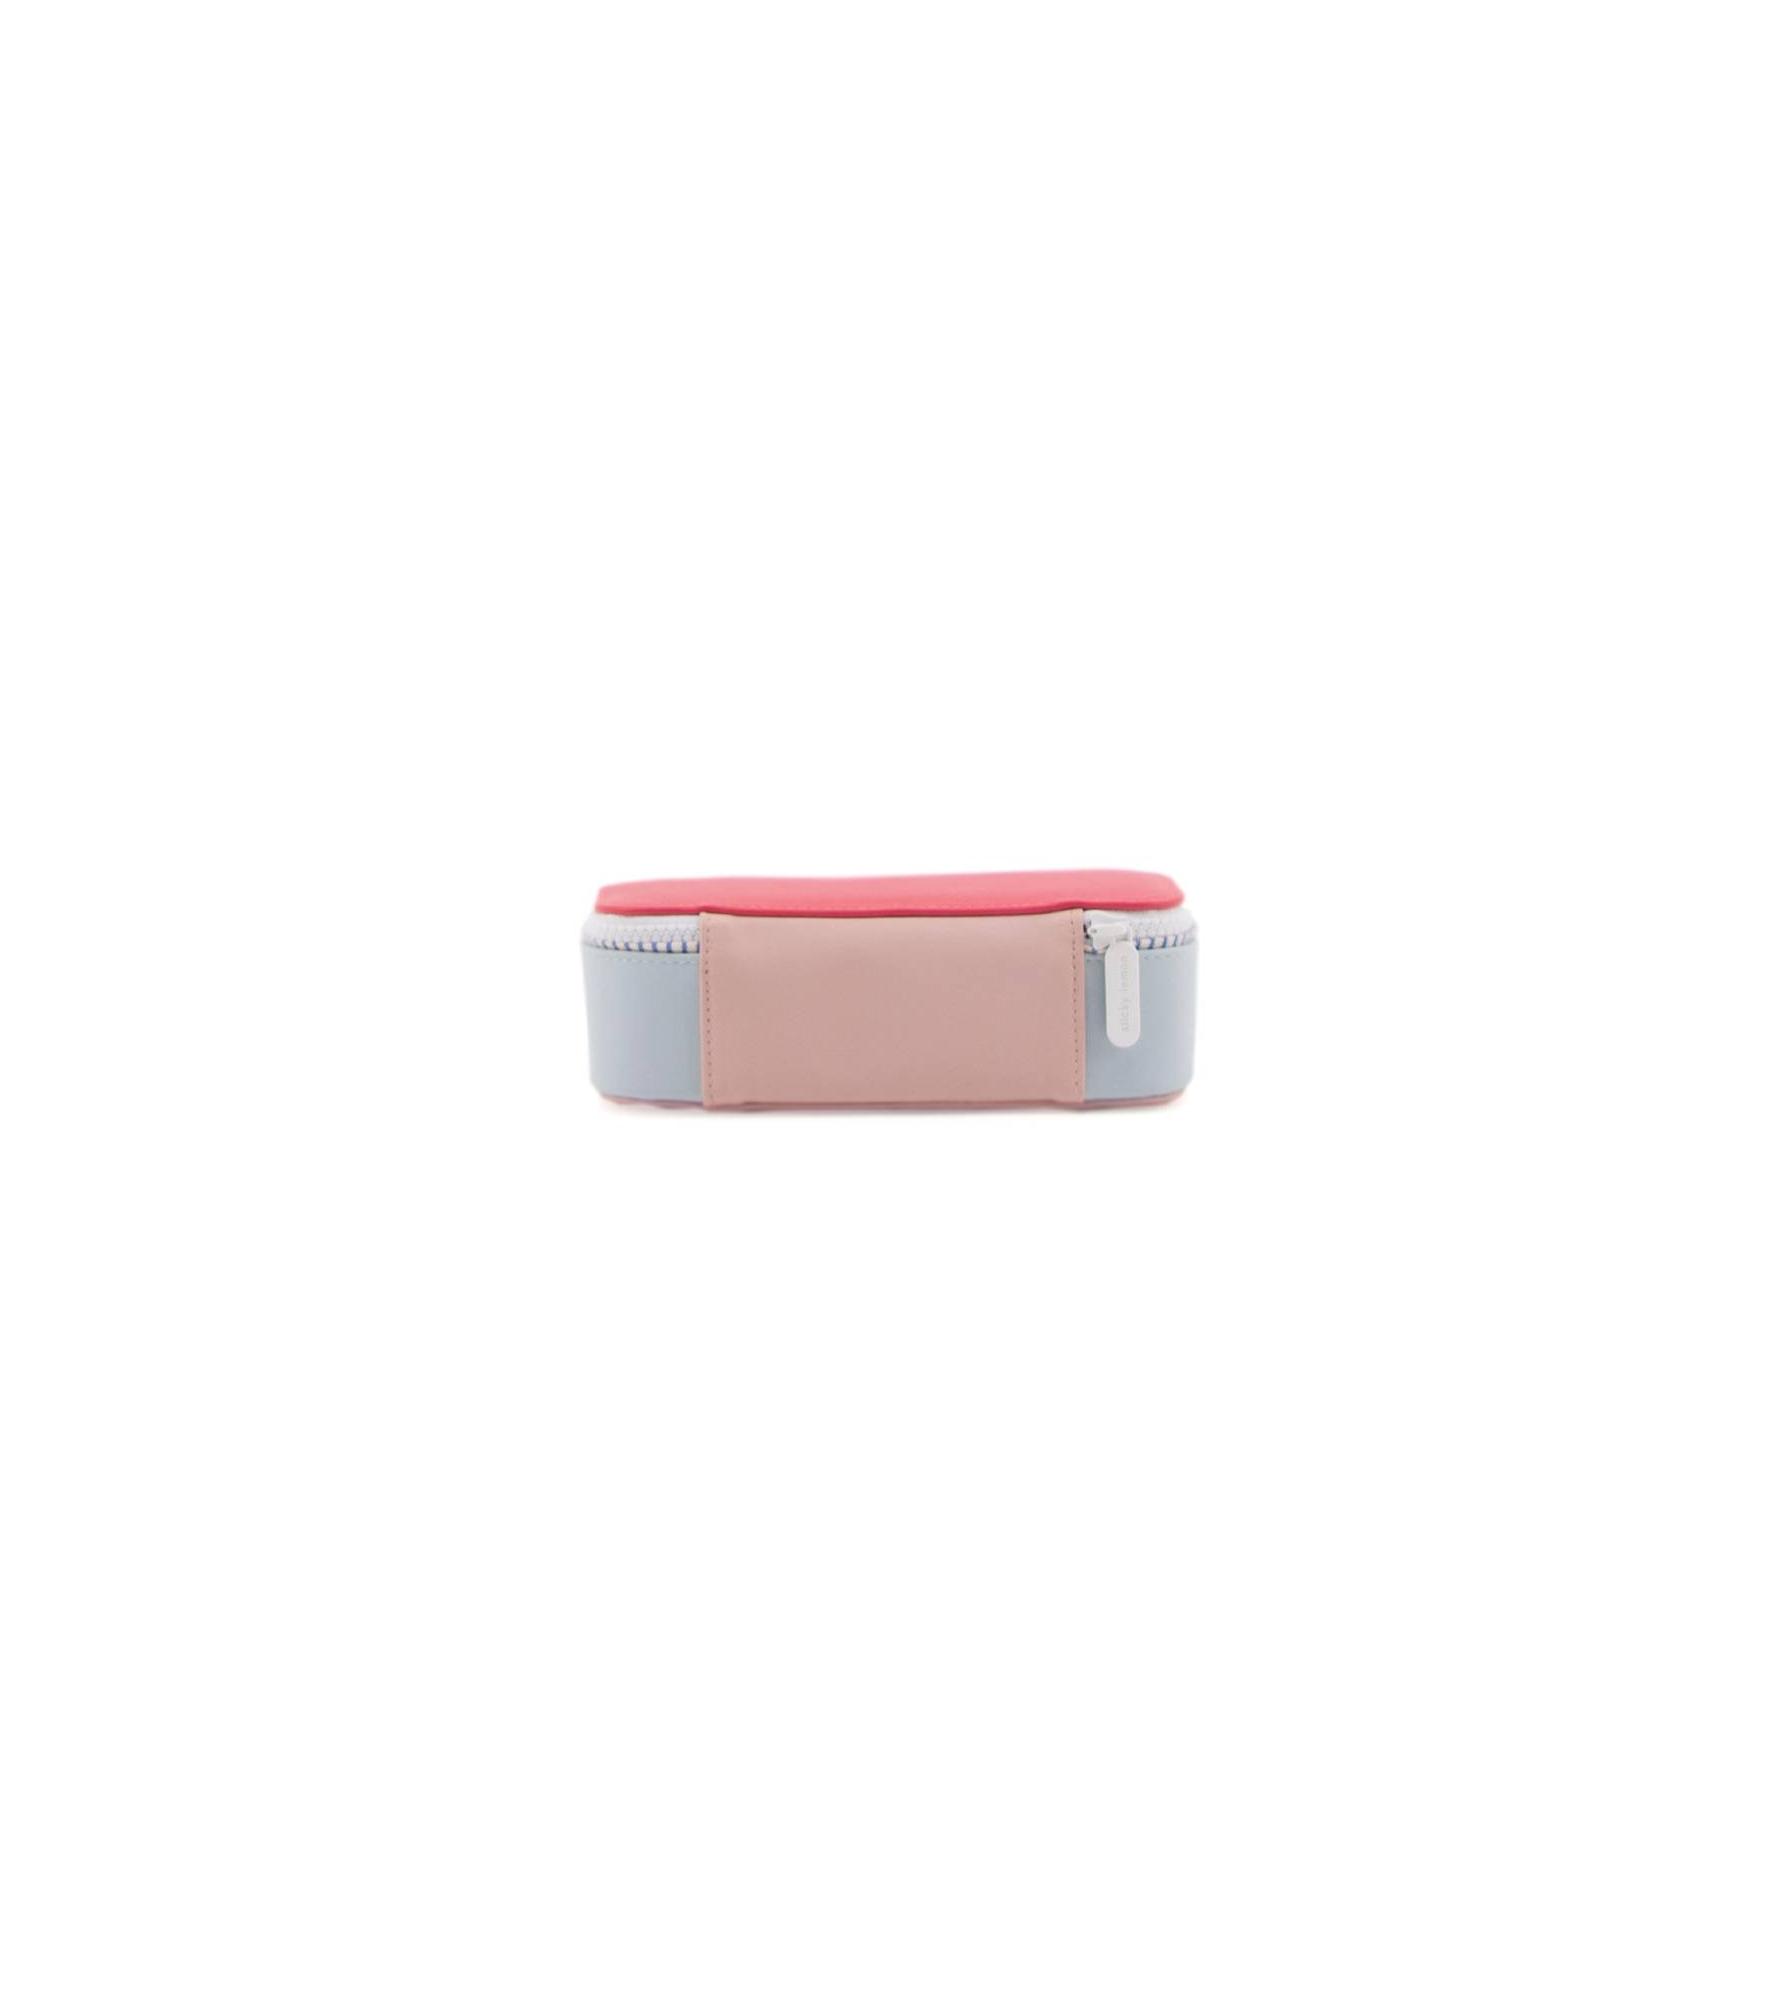 1801422 - Sticky Lemon - pencilbox - Mendl's pink, agatha blue, elevator red - back_edit.jpg